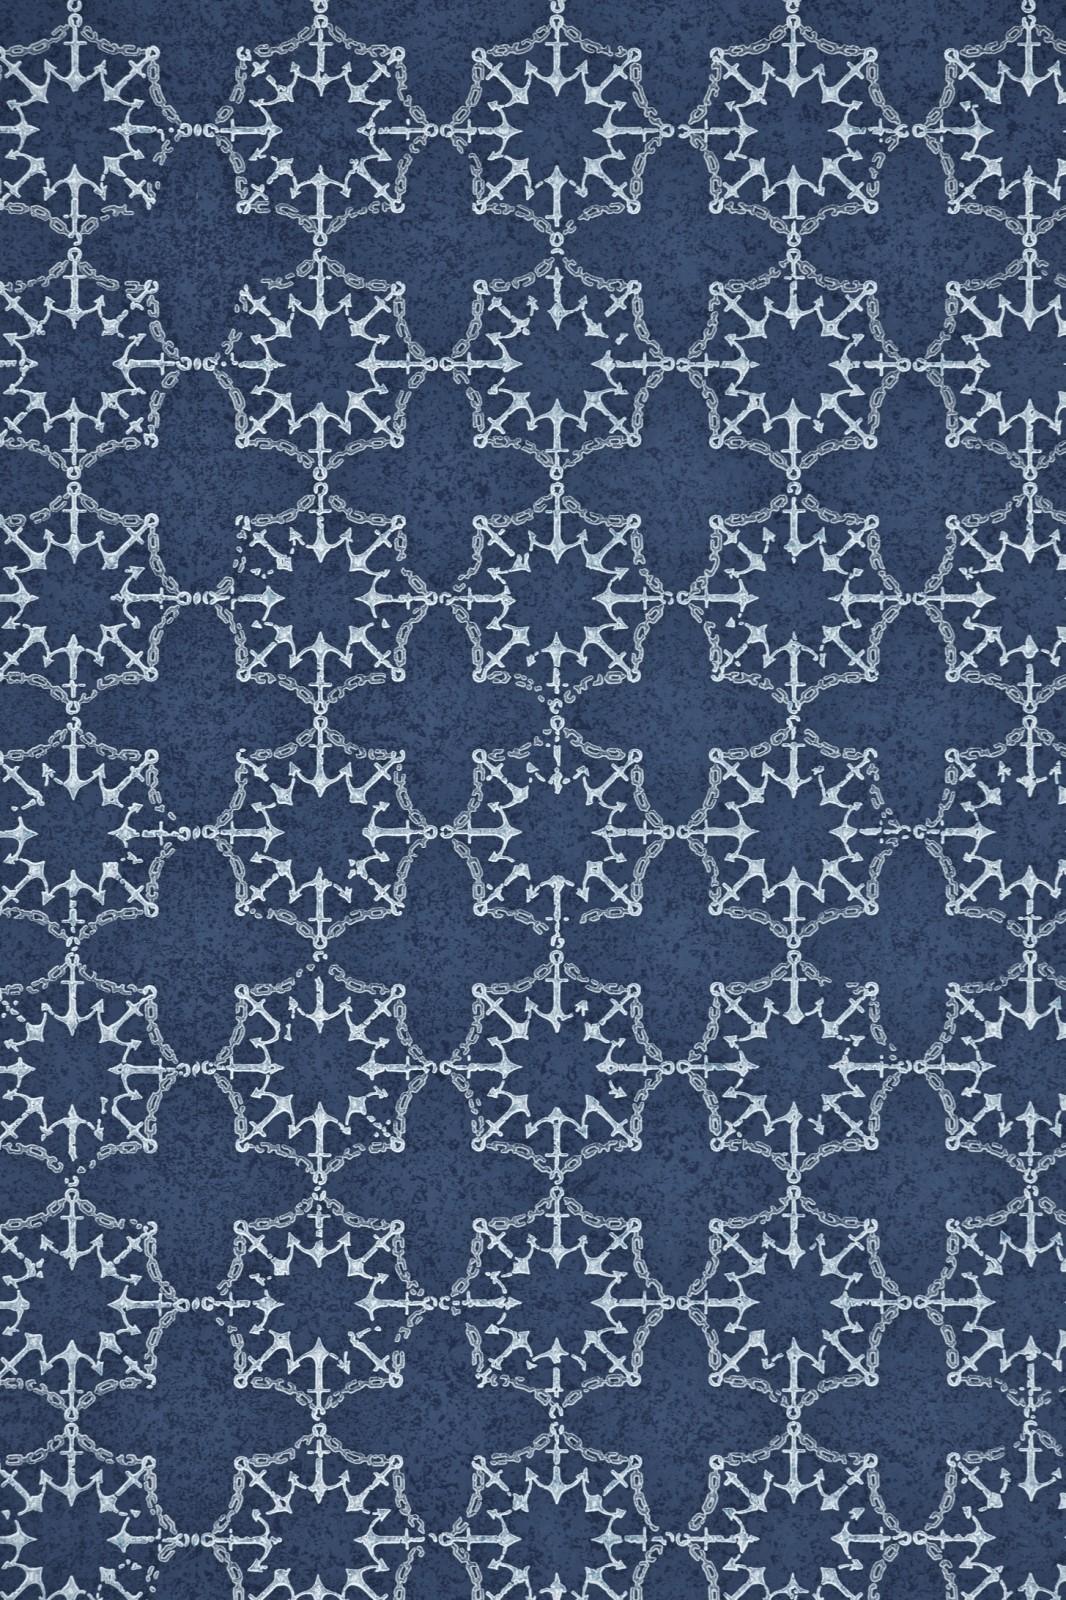 Anchor Tile Wallpaper Marine